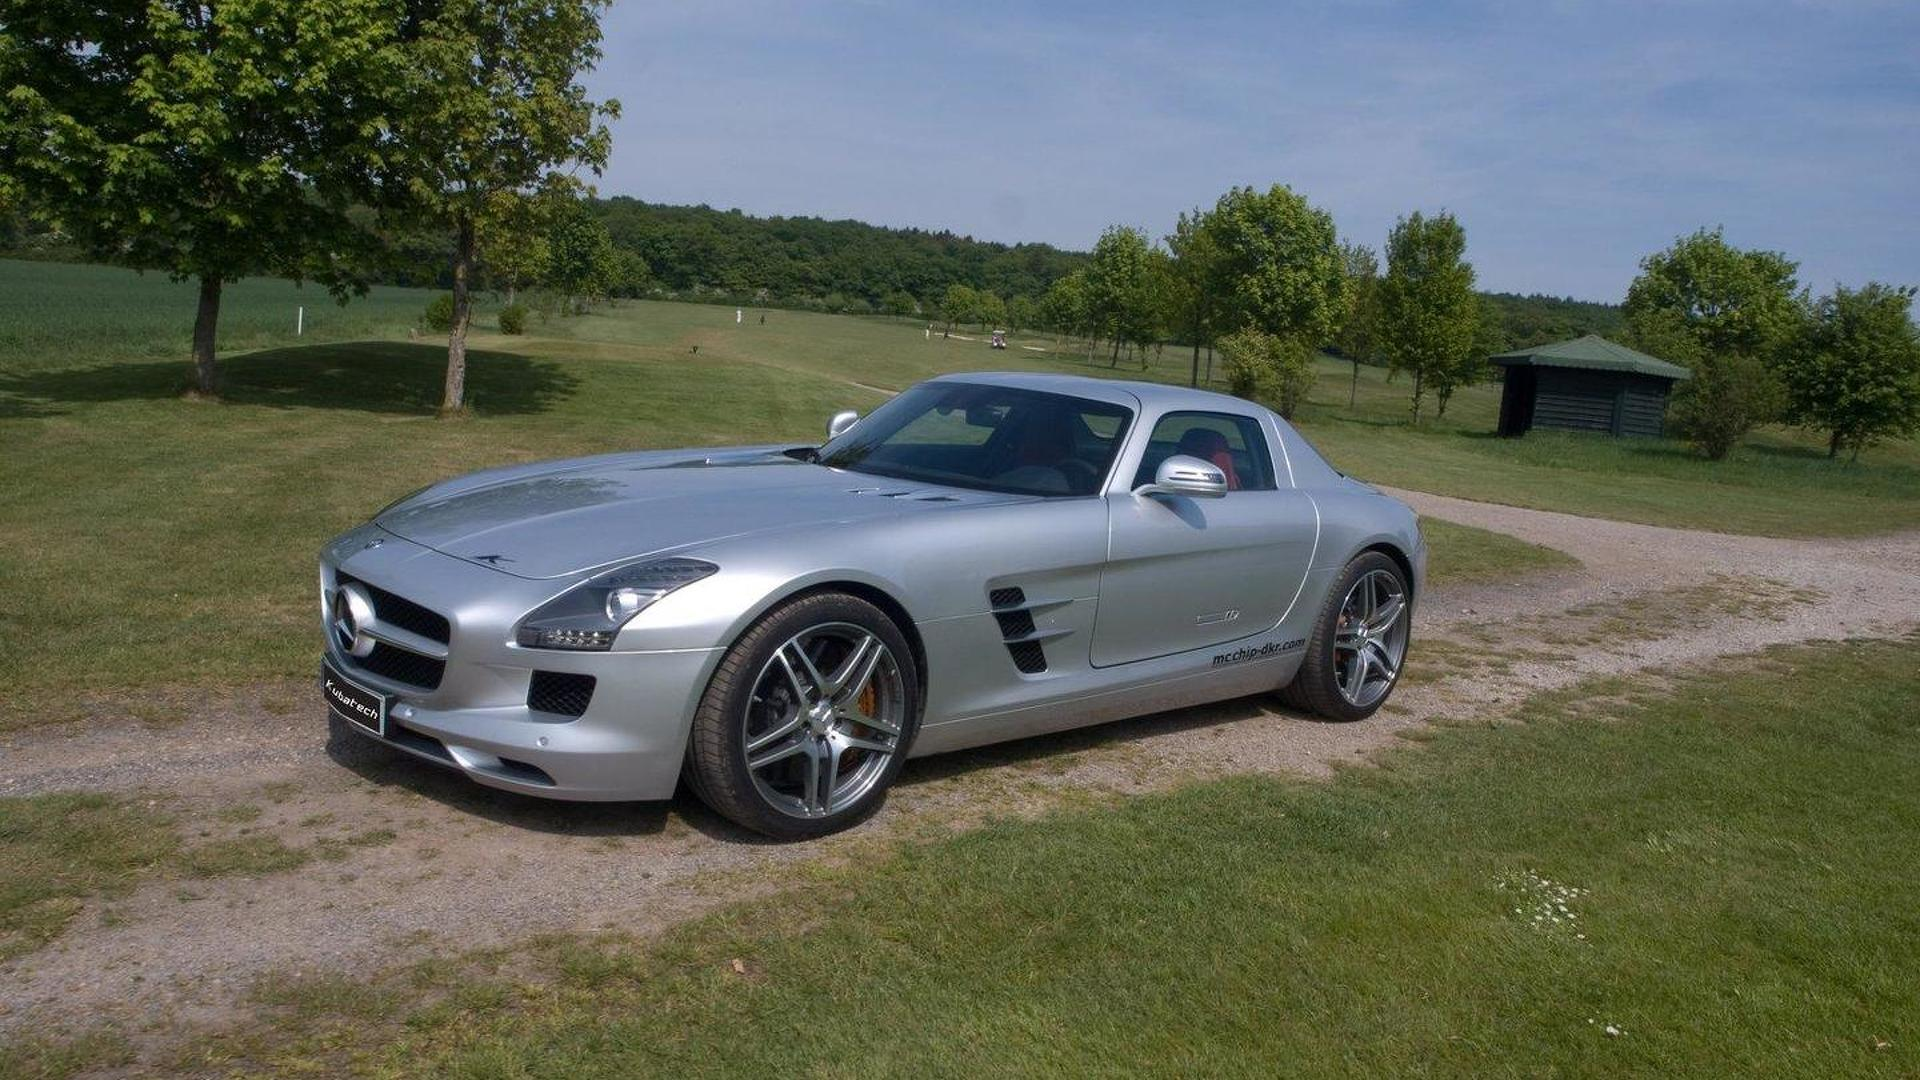 Mercedes-Benz SLS AMG power upgrade by Kubatech